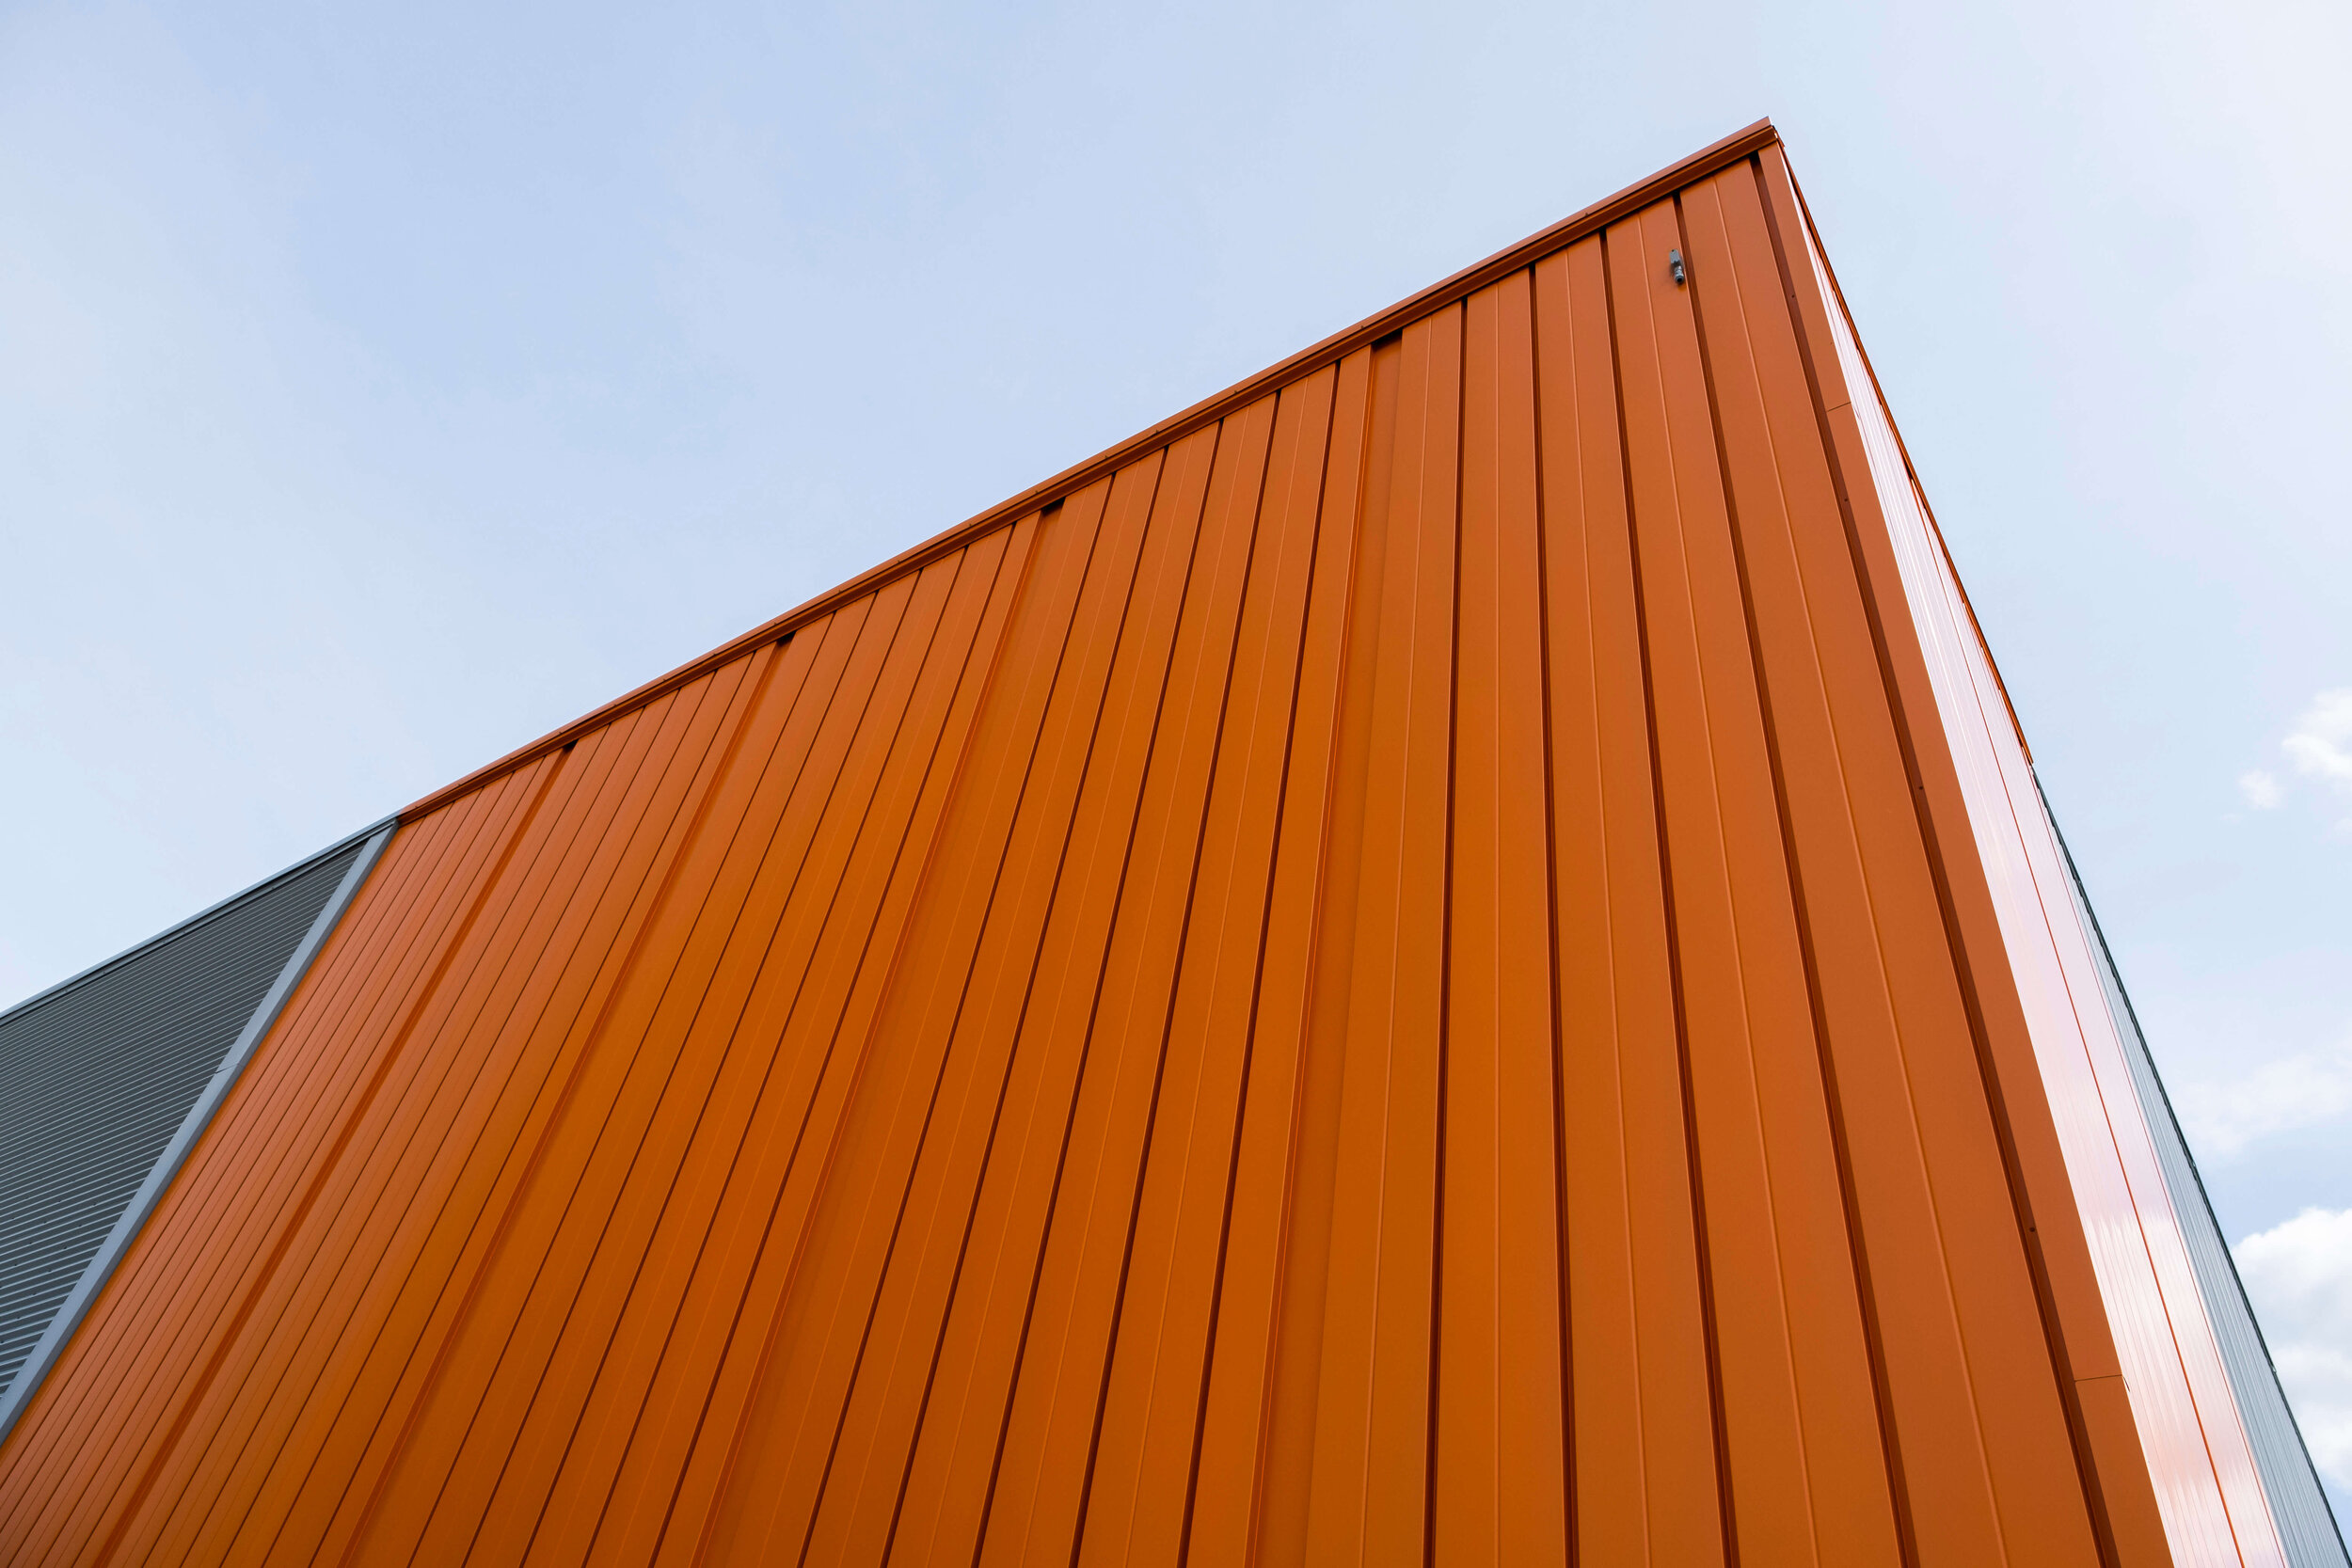 PR08 - Batisse orange_009.jpg